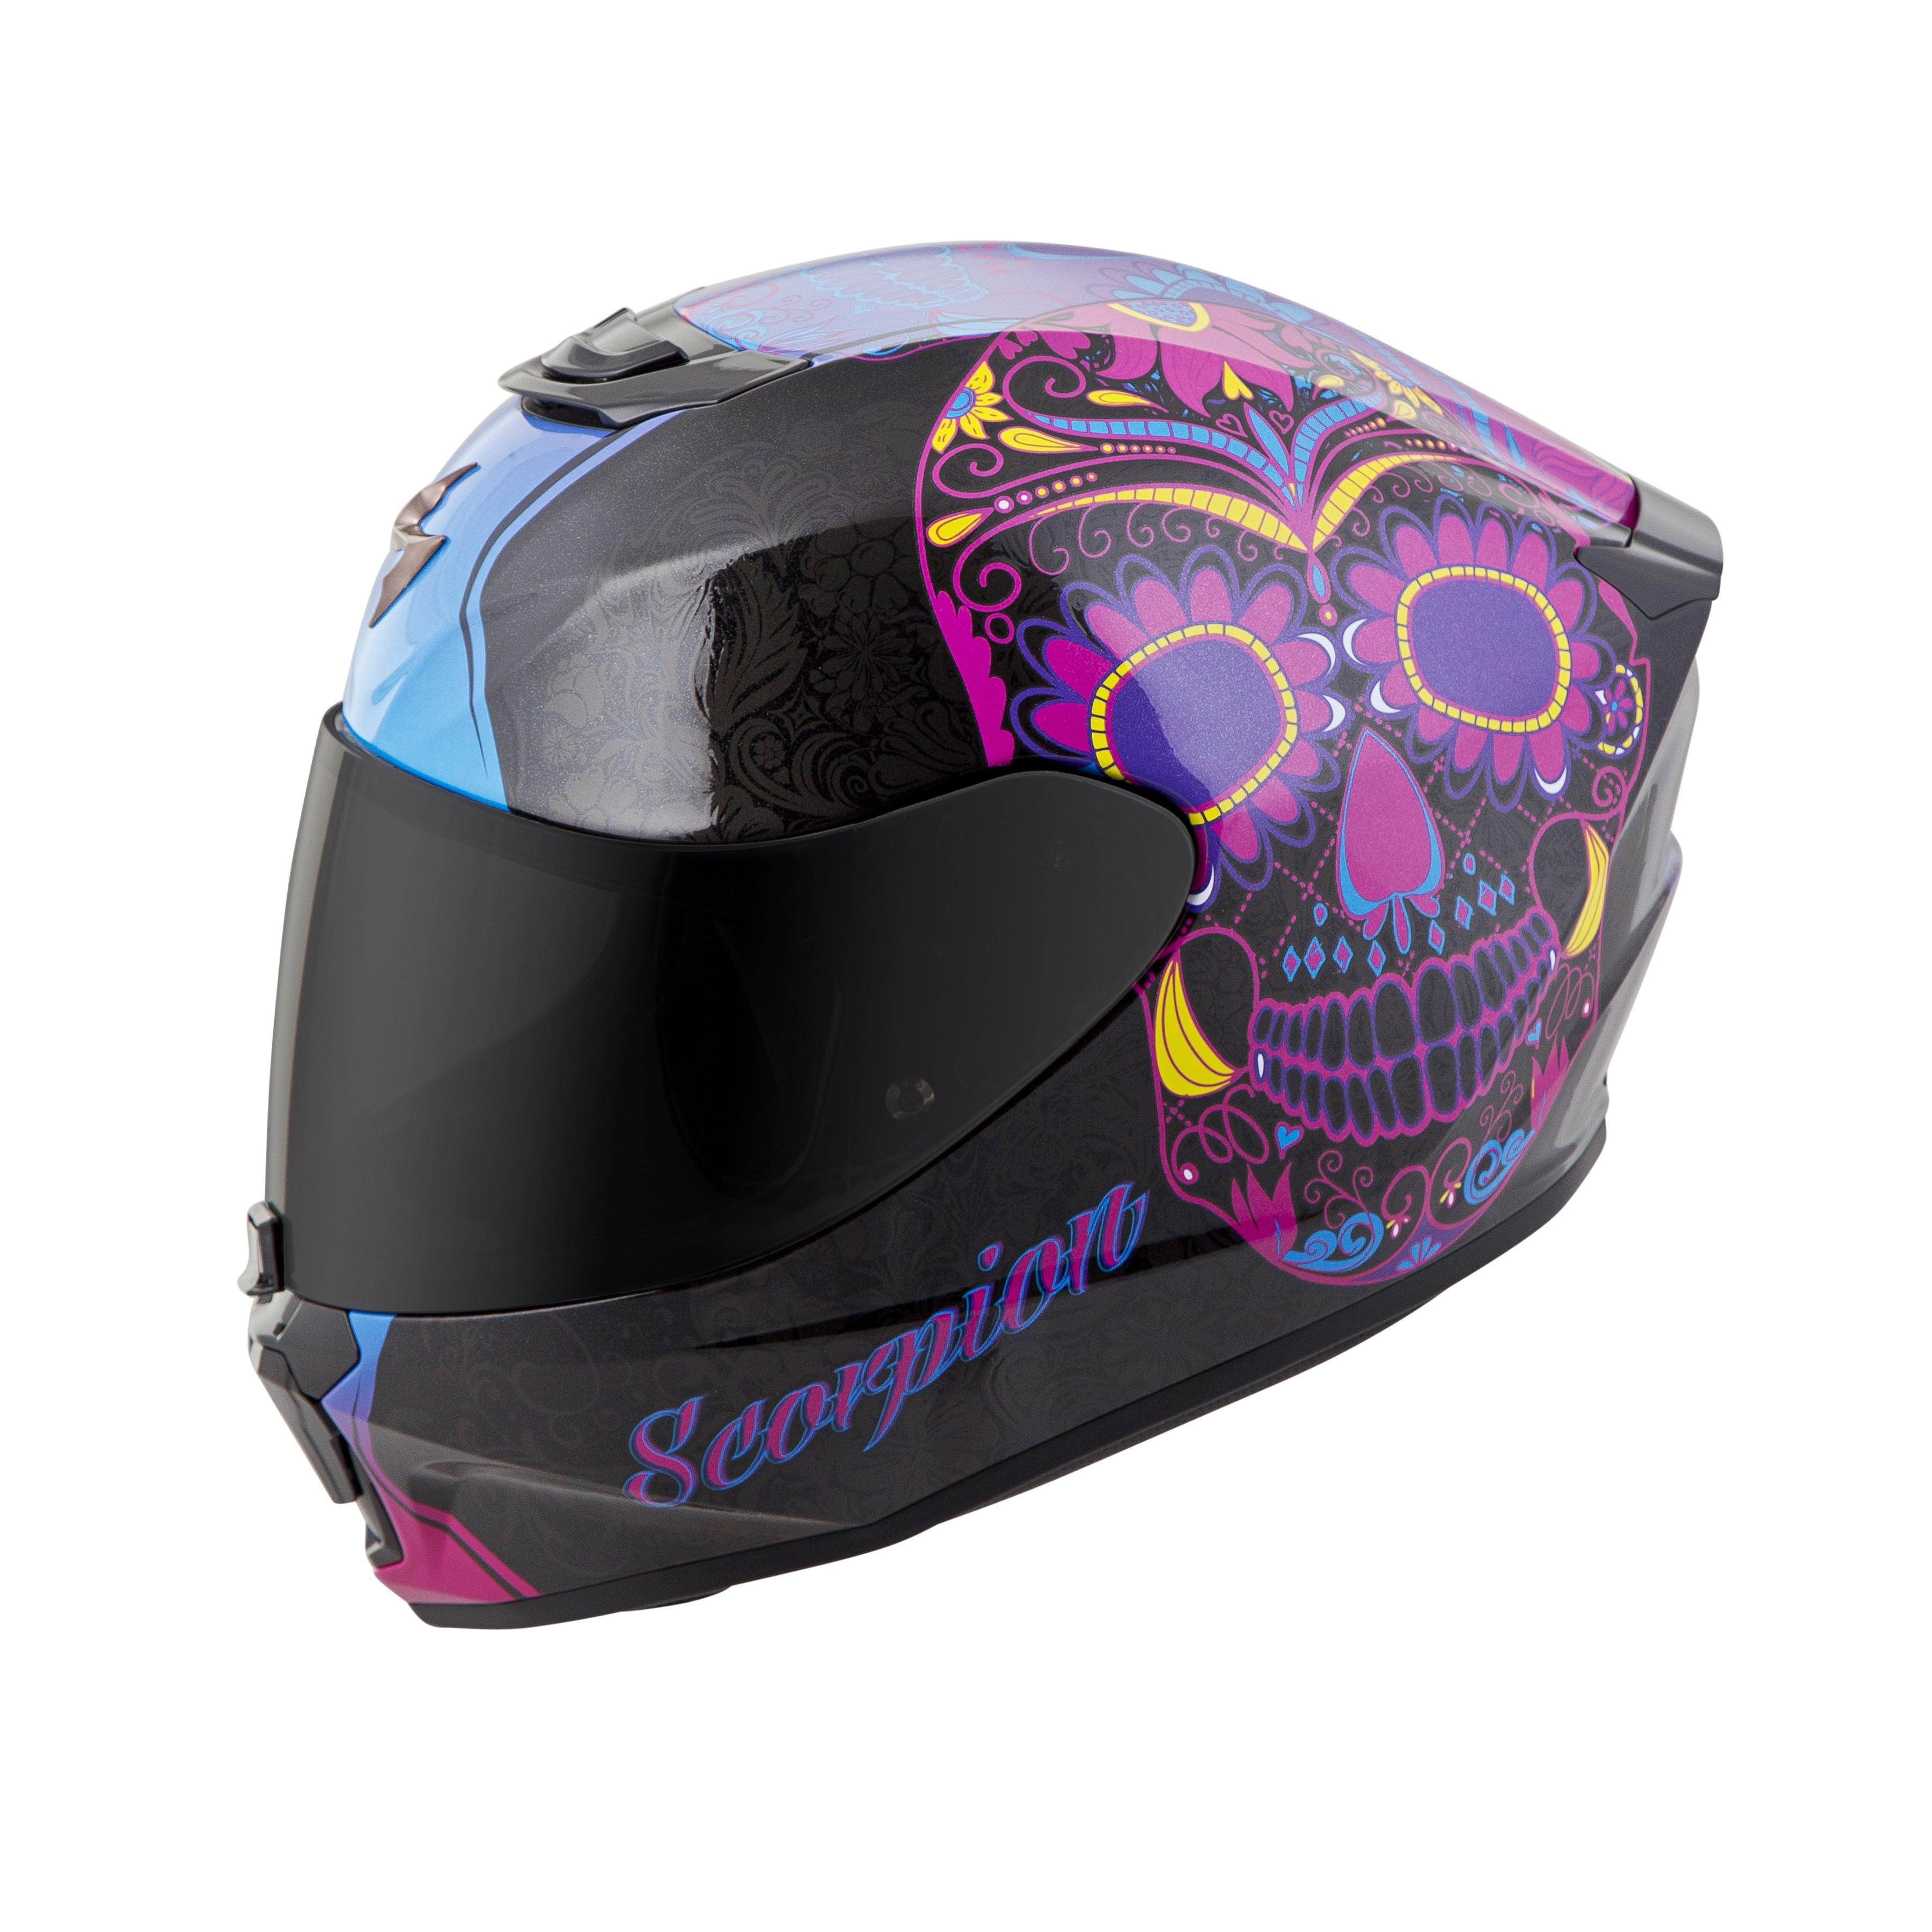 Scorpion Helmets EXO-R420 Sugarskull Helmet